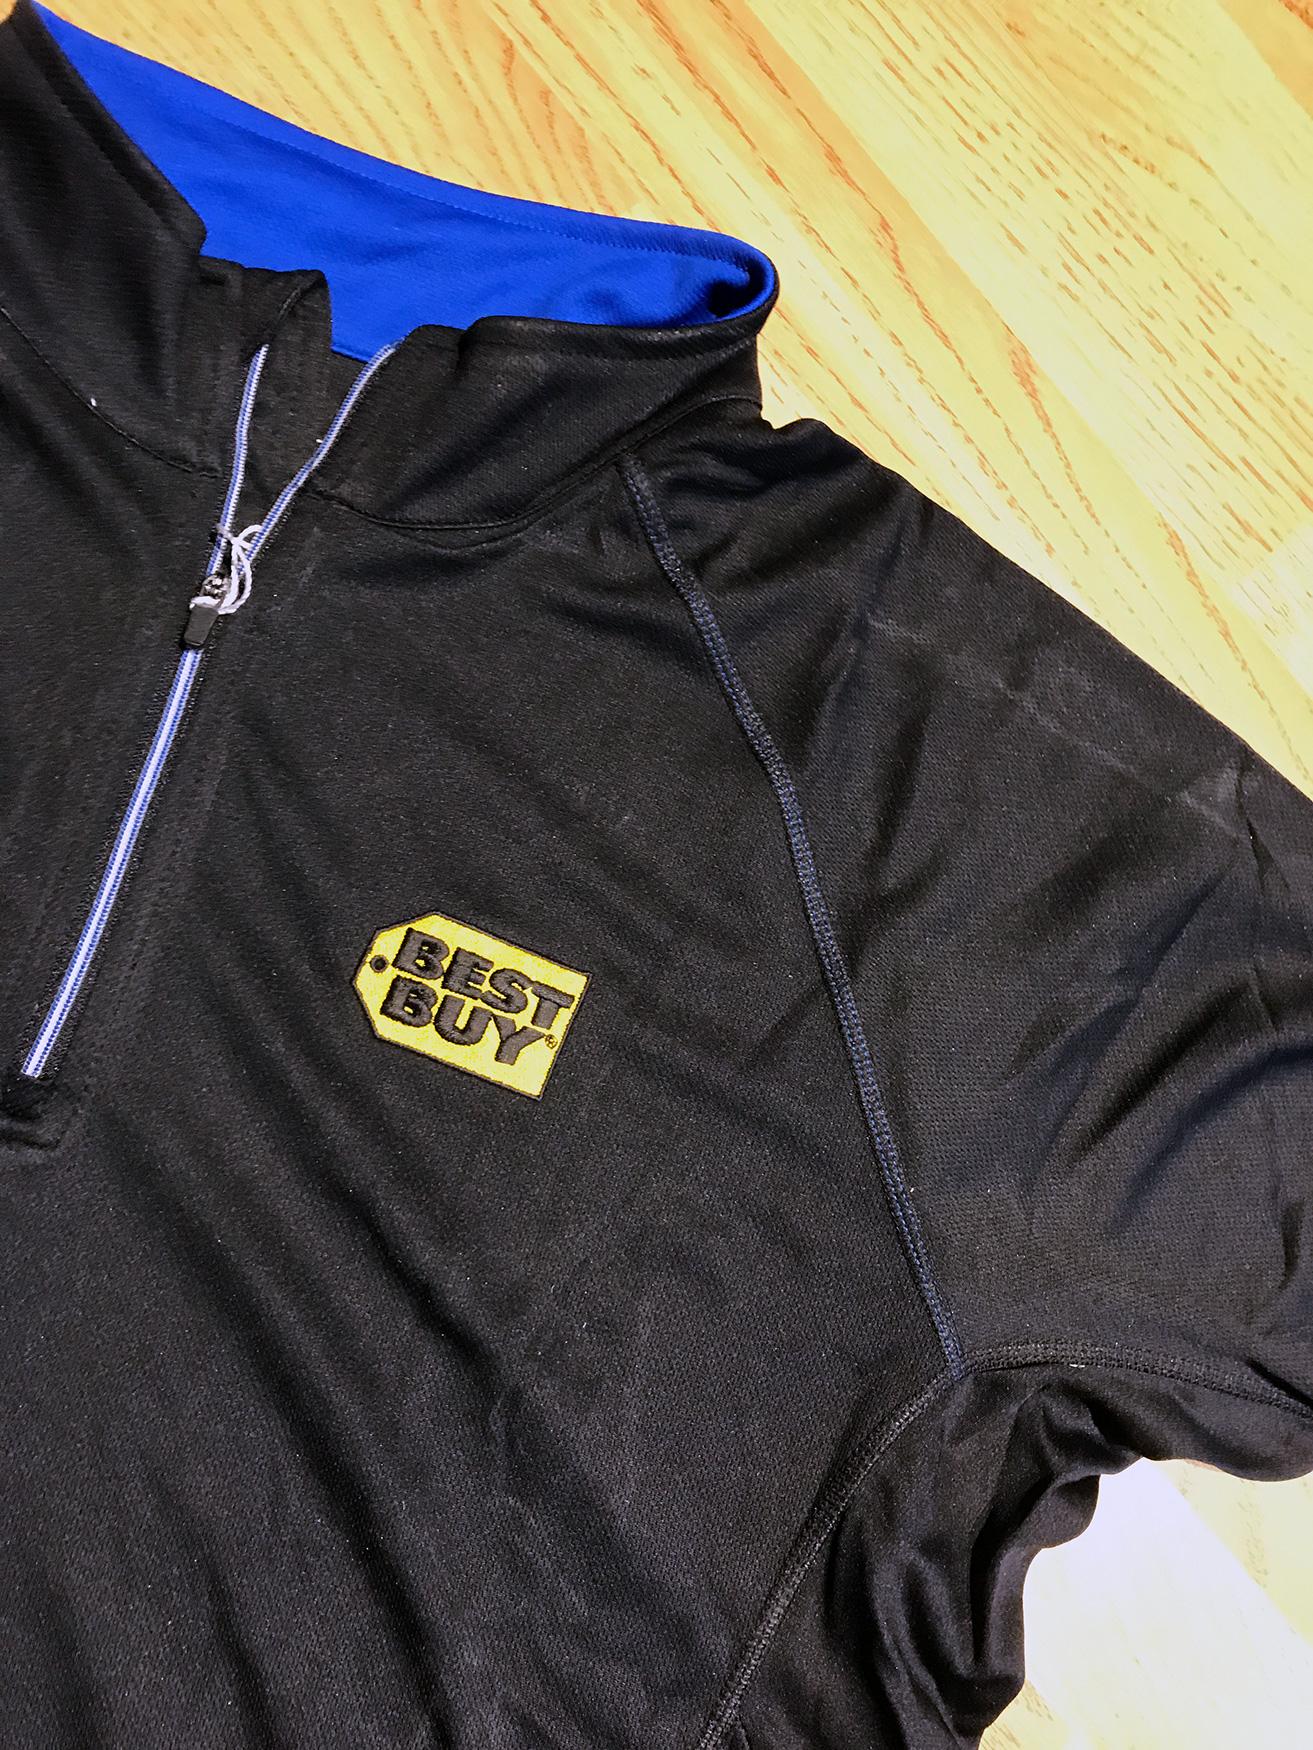 Best Buy Black Pullover | Apparel, Uniforms, Custom Embroidery | Medford, MA